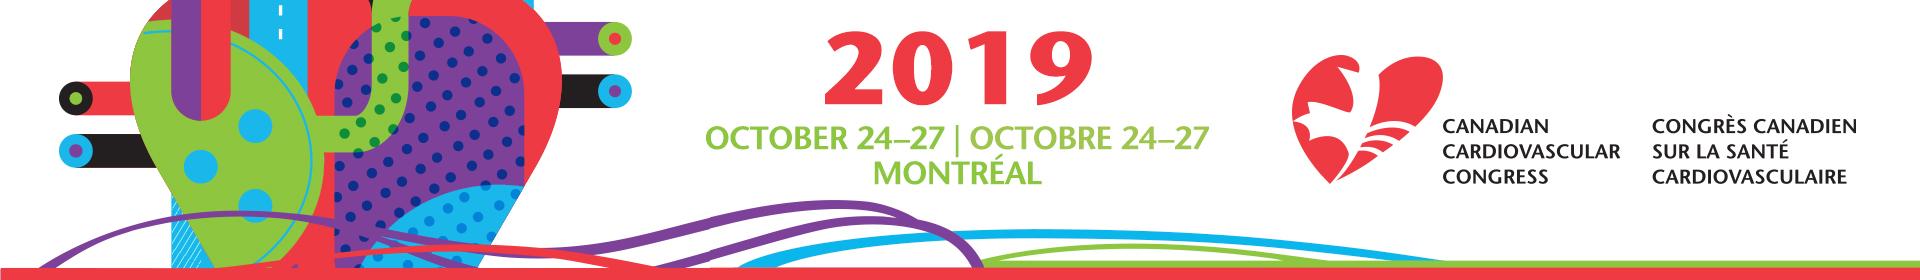 2019 Canadian Cardiovascular Congress Event Banner